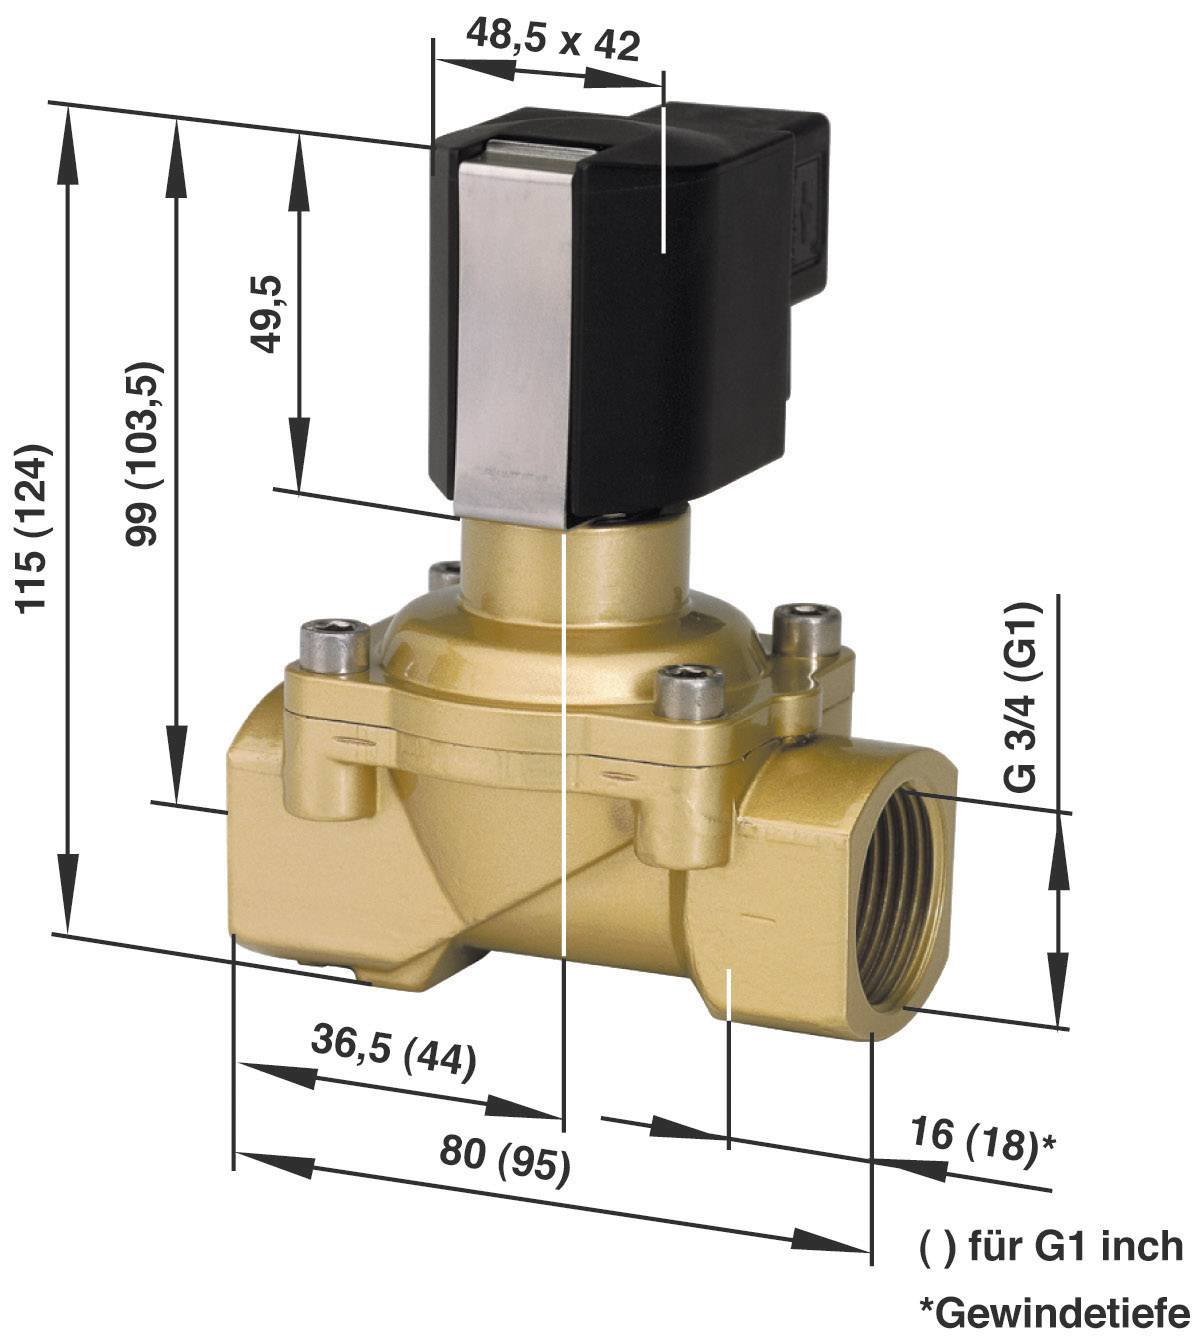 2/2-cestný mechanicky odolný ventil pneumatiky Busch Jost 8254400.9154.23049, G 1, 230 V/AC